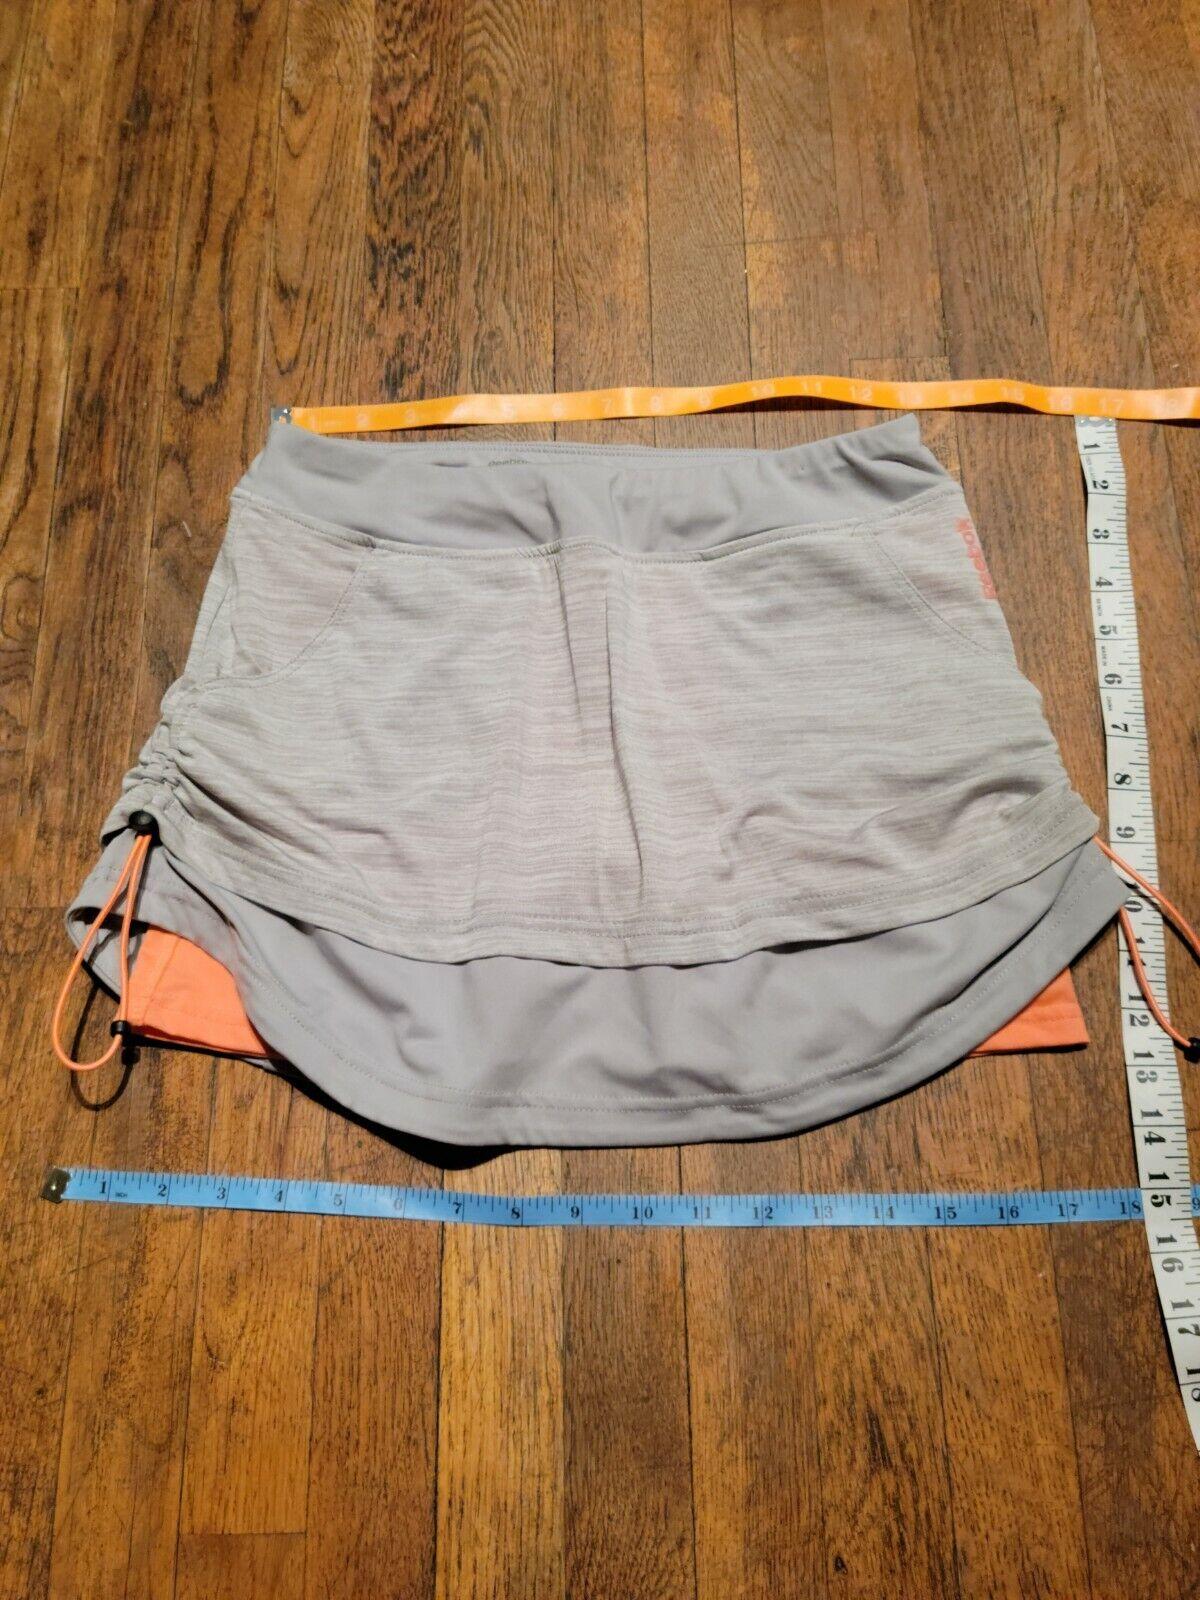 Reebok Women's Running Skort Gray & Neon Orange Sz S dual 2 layers paracord